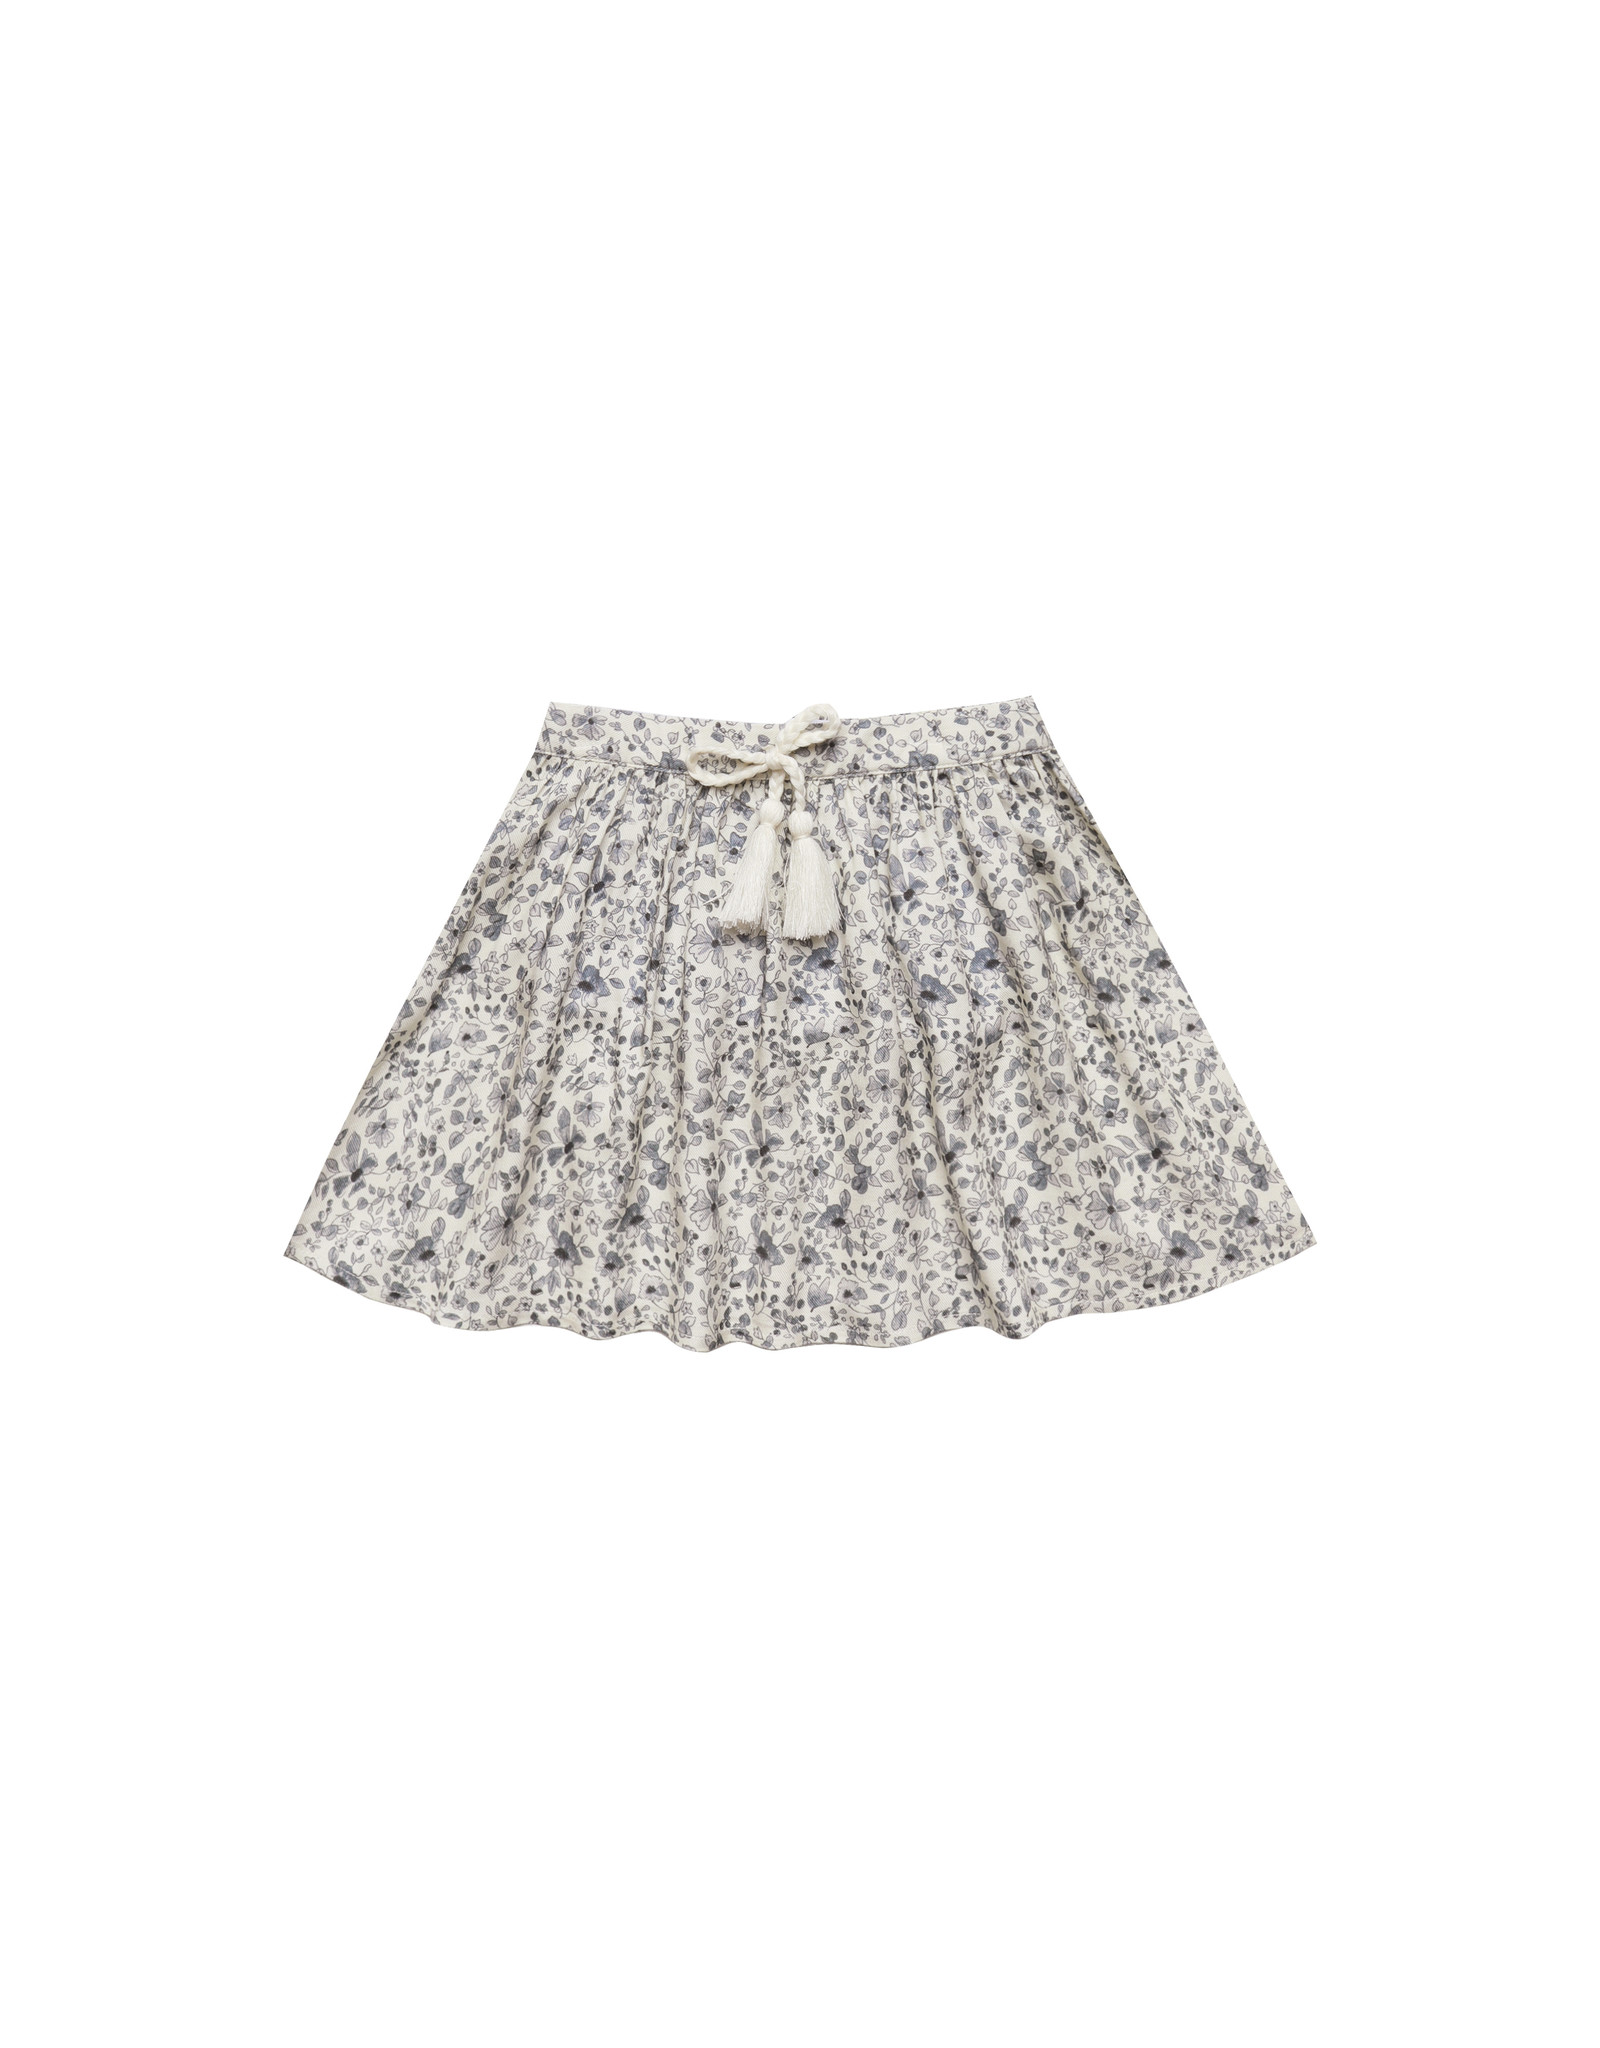 Rylee + Cru Blue Floral Drawstring Skirt